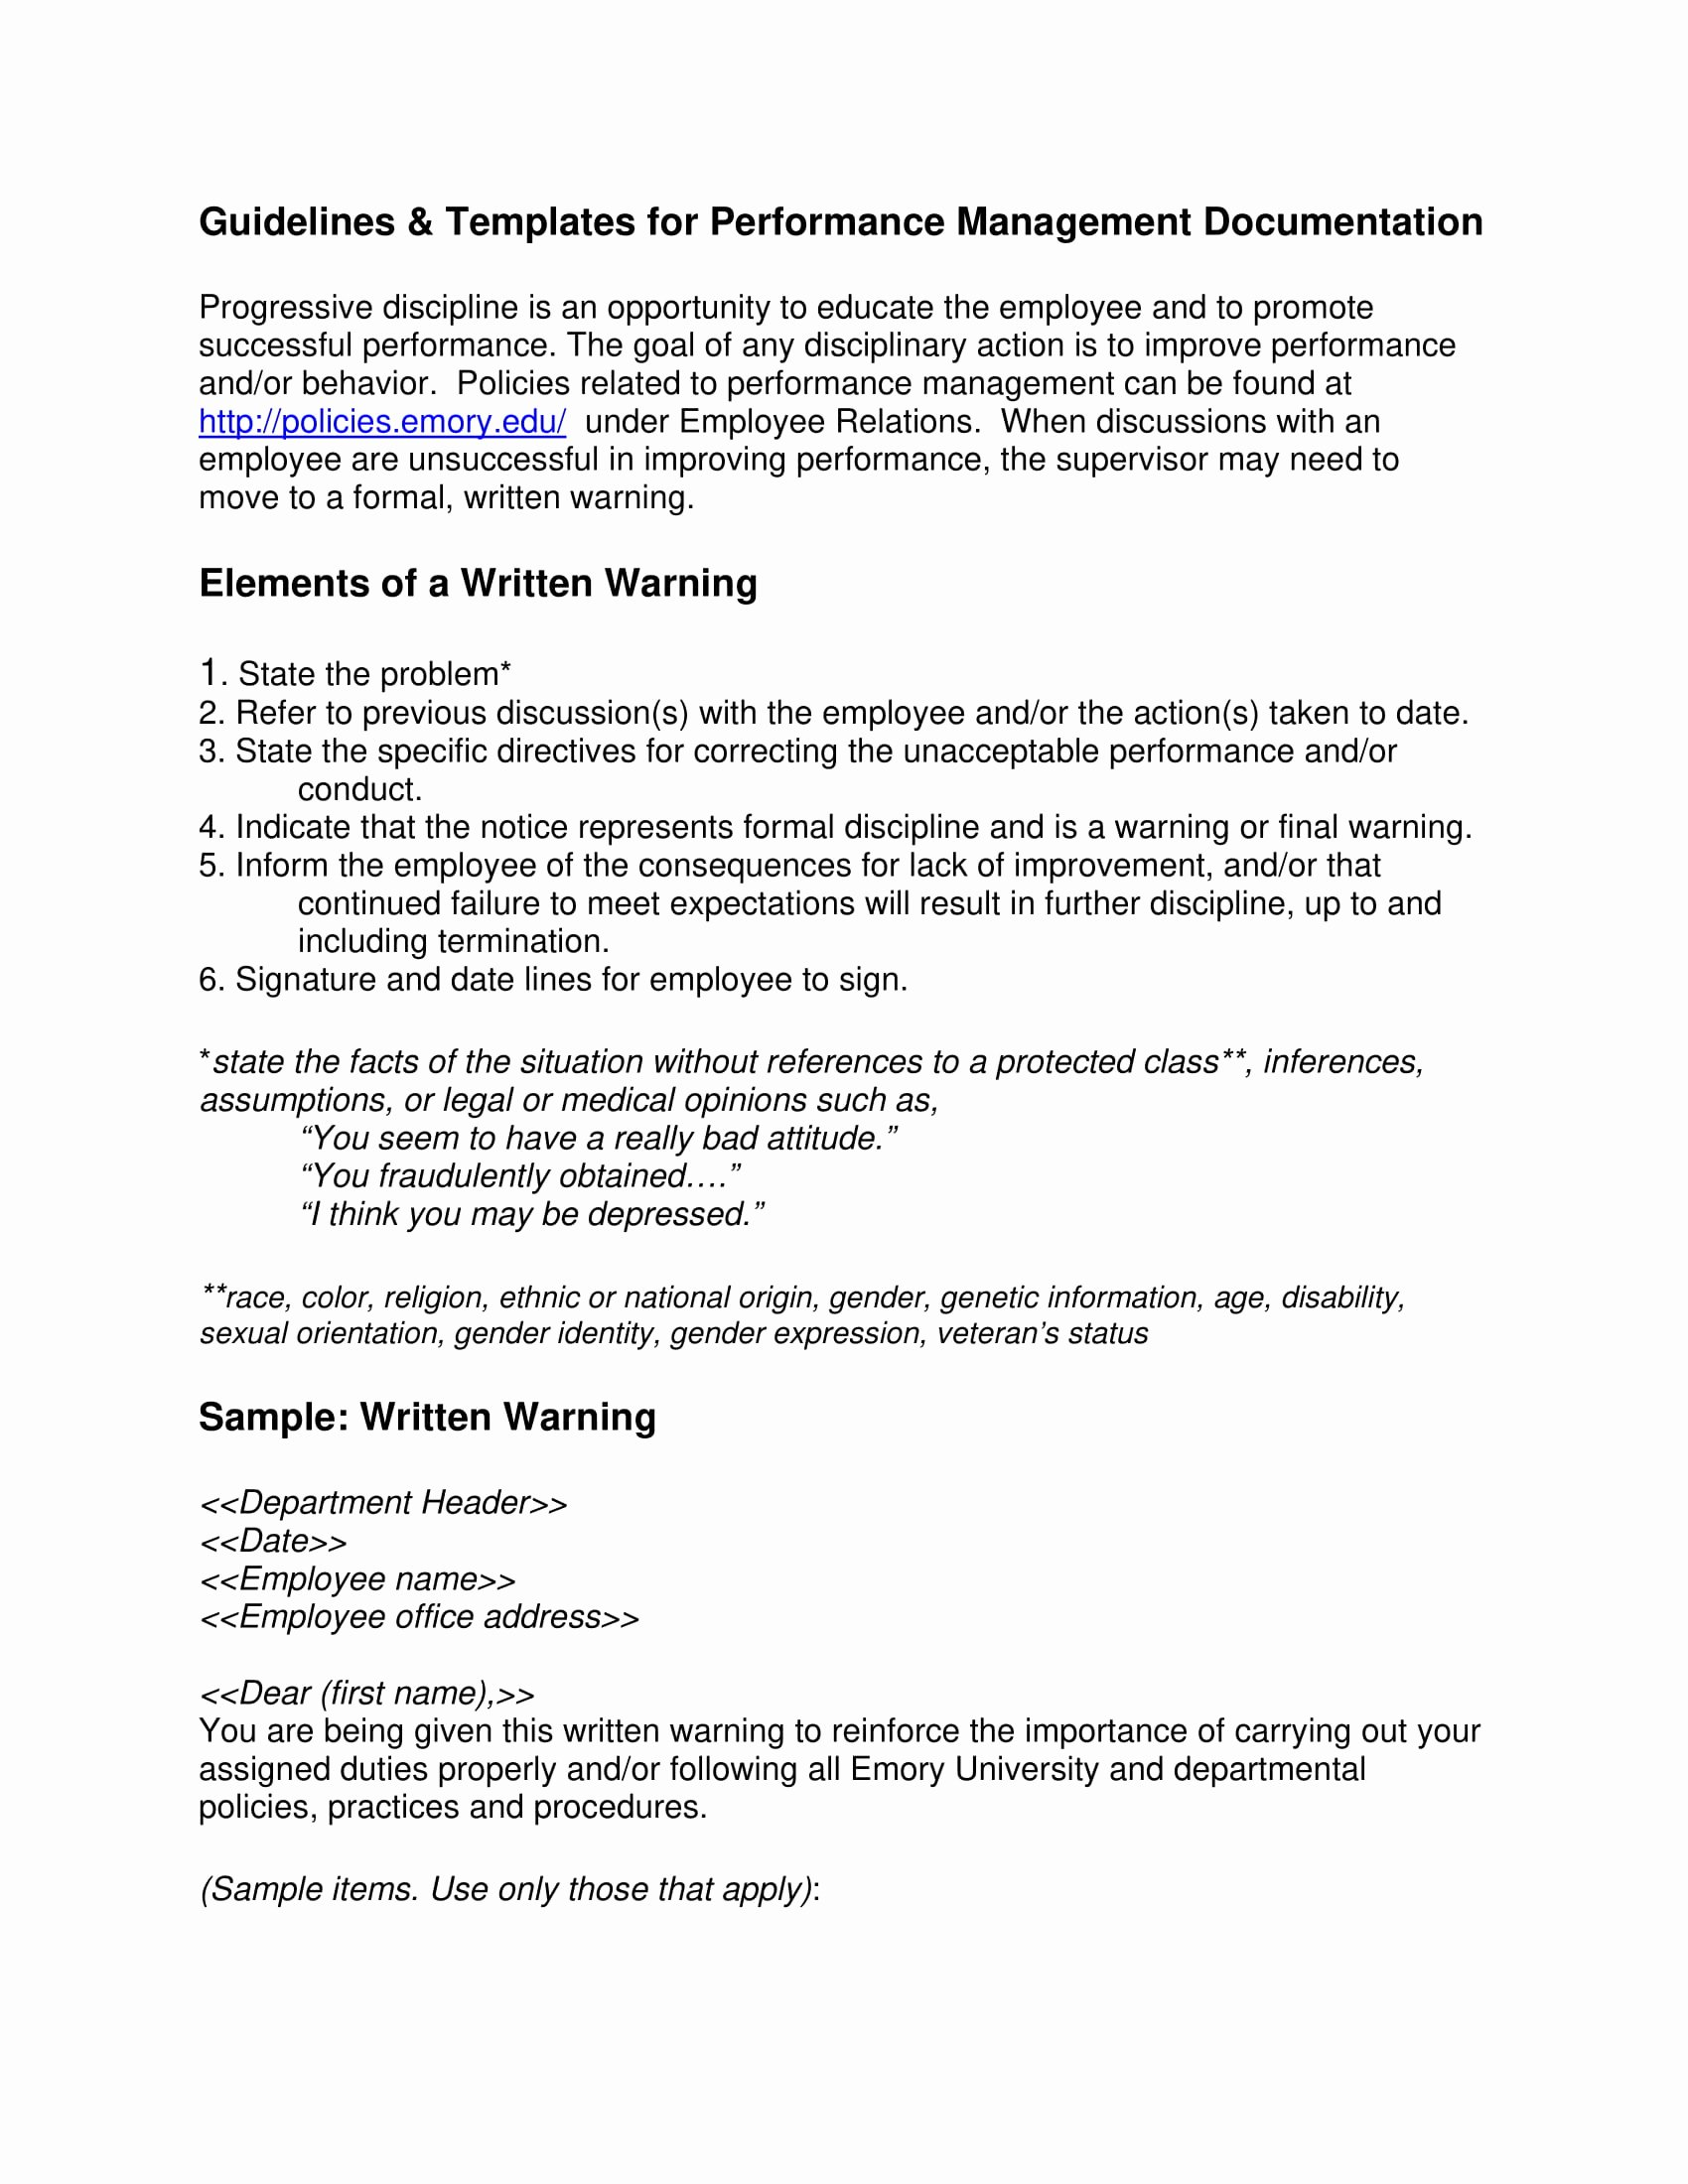 Employee Written Warning Sample Letter New 11 Employee Warning Letter Examples Pdf Google Docs